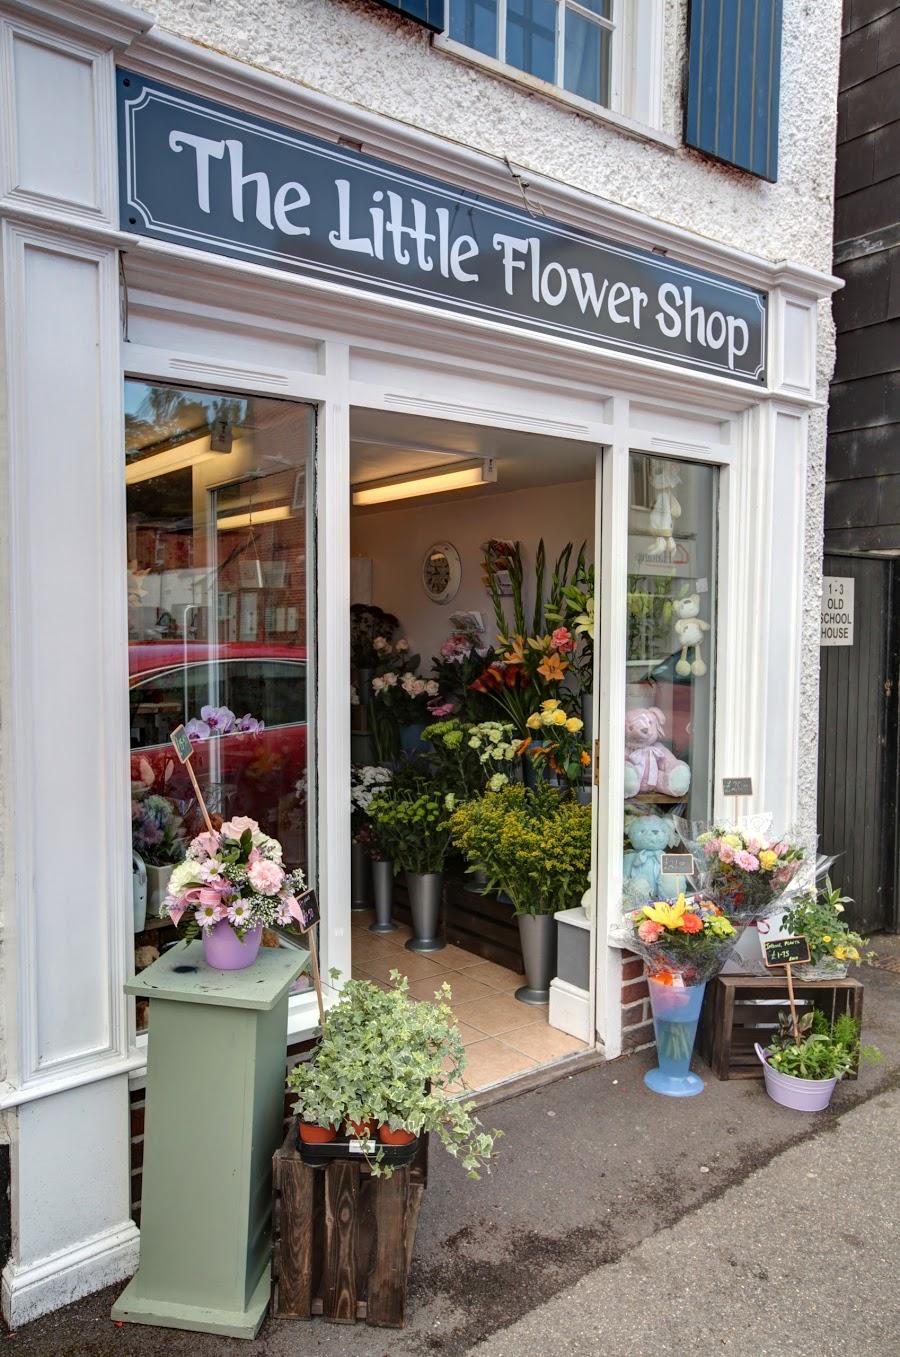 The Little Flower Shop (Amesbury)